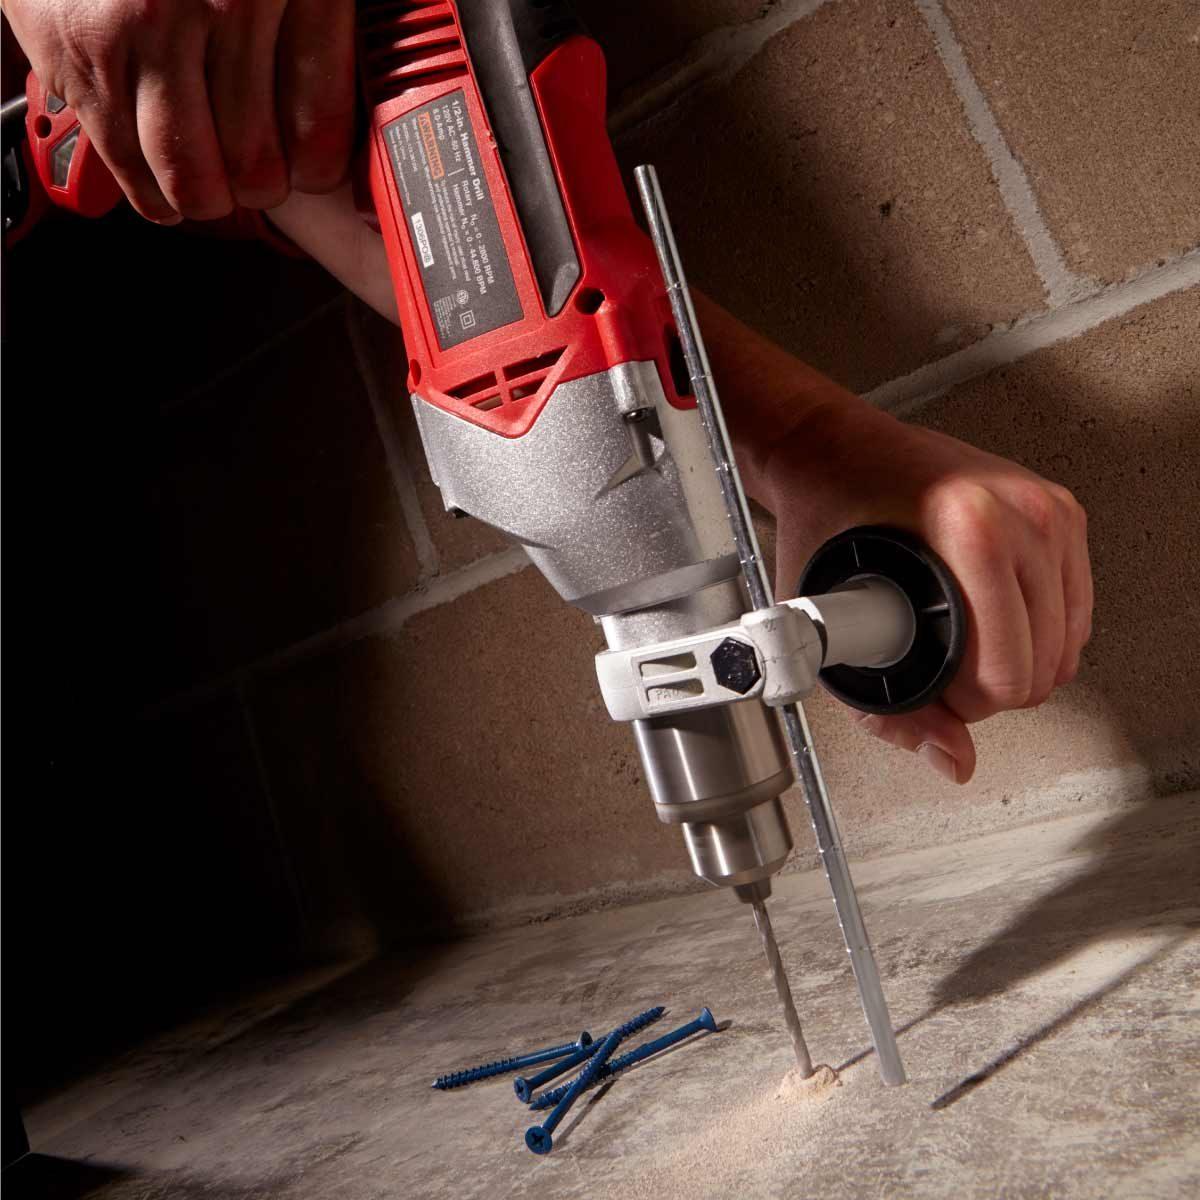 rotary vs hammer drills